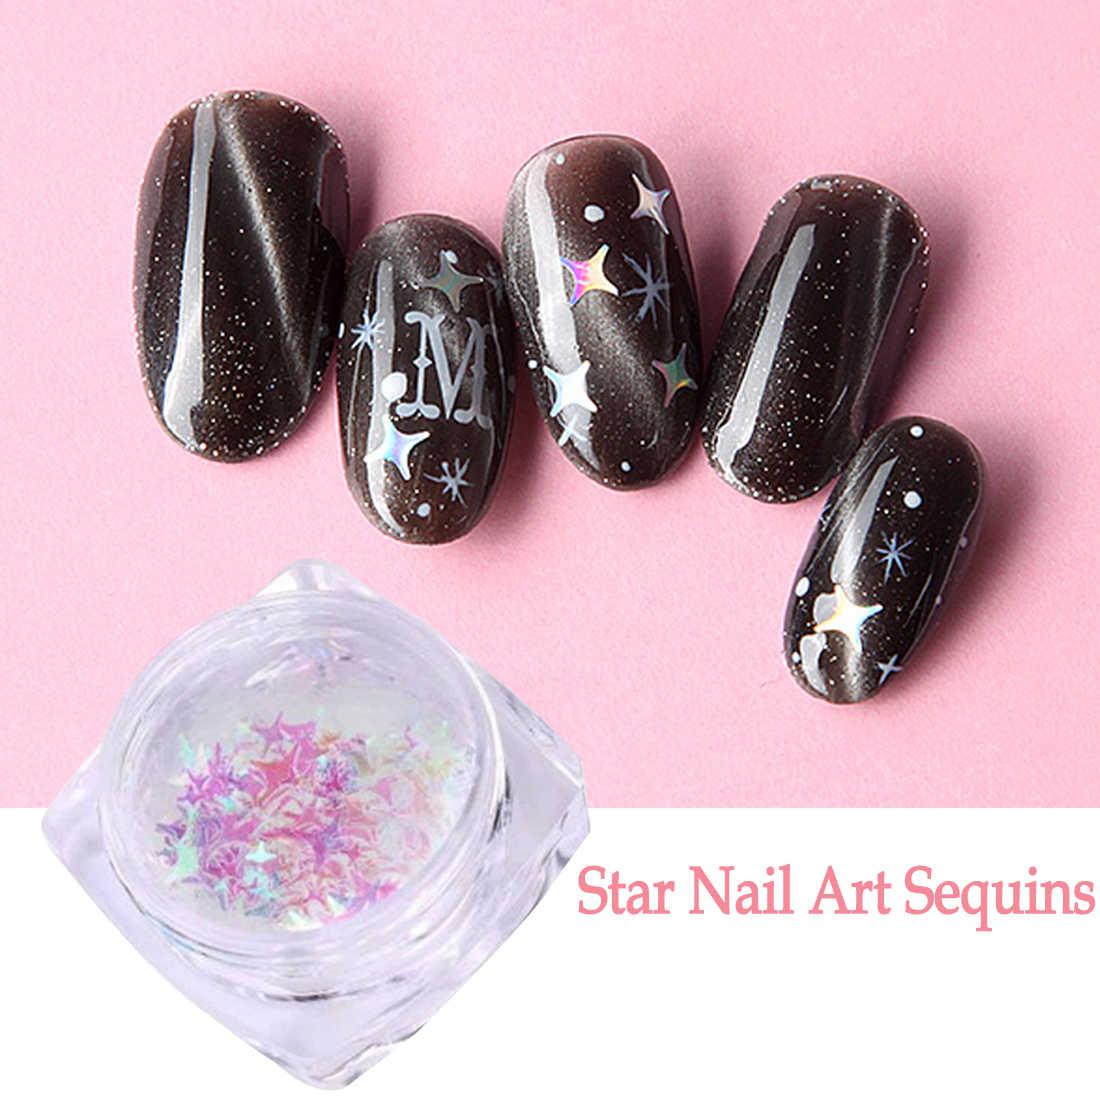 Nail Art Dekorasi DIY Paillette Berkilauan Nail Flake Fantasy 3/4mm Mix Ukuran Empat Sudut Bentuk Bintang Lucency cantik Sequin